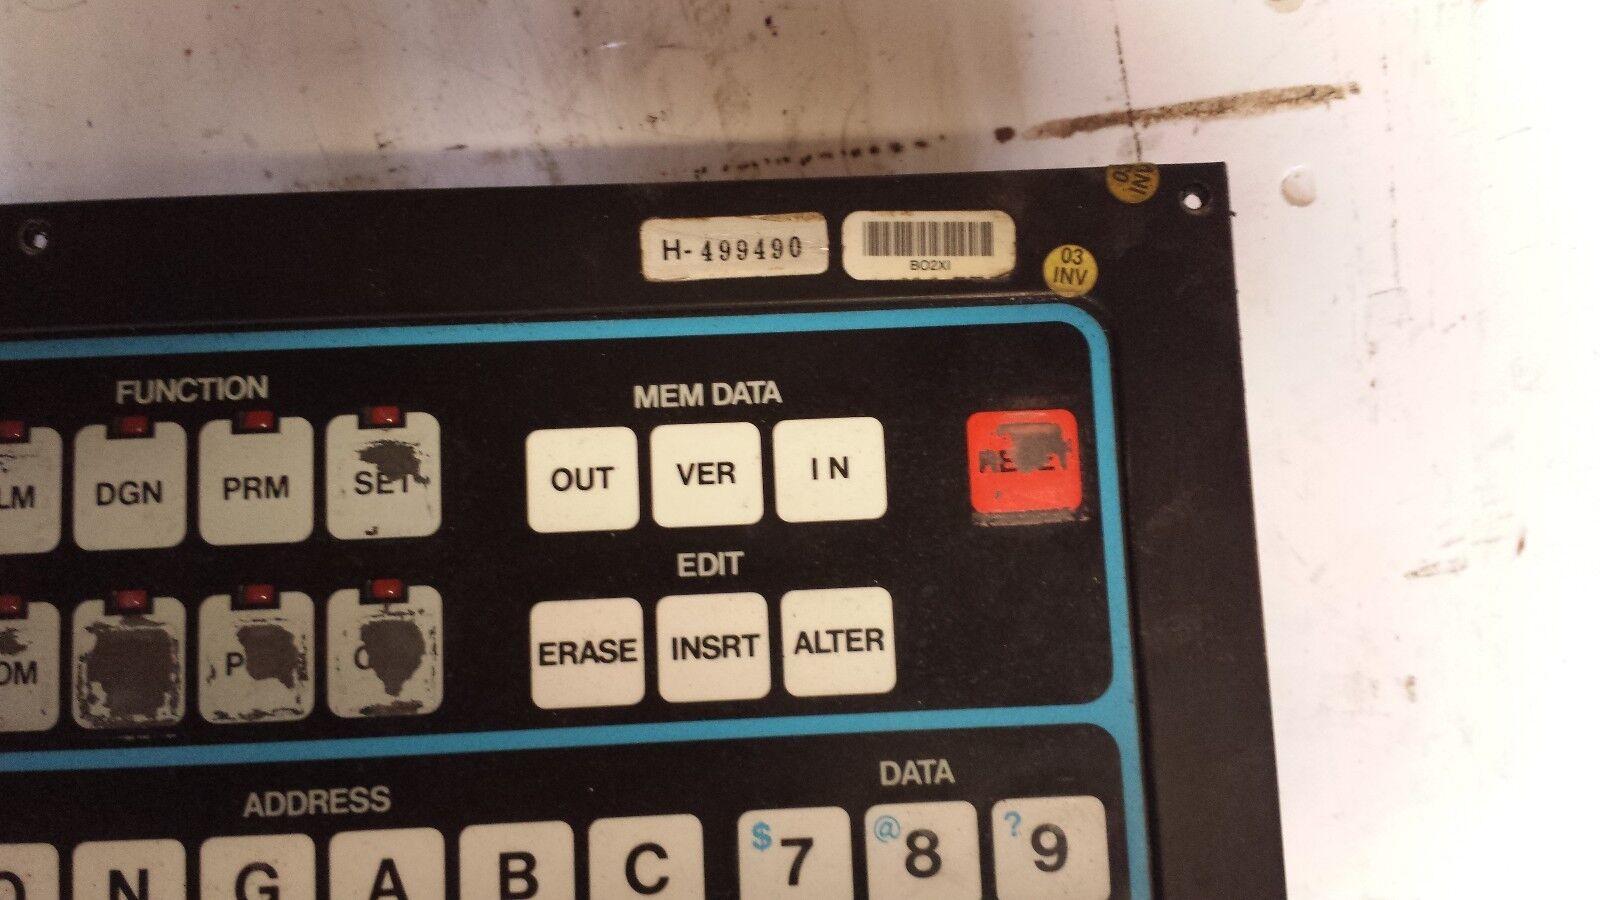 matsuura mc 1000v yasnac mx 1 operator panel h499490 ebay rh ebay com Yasnac MX3 Manual